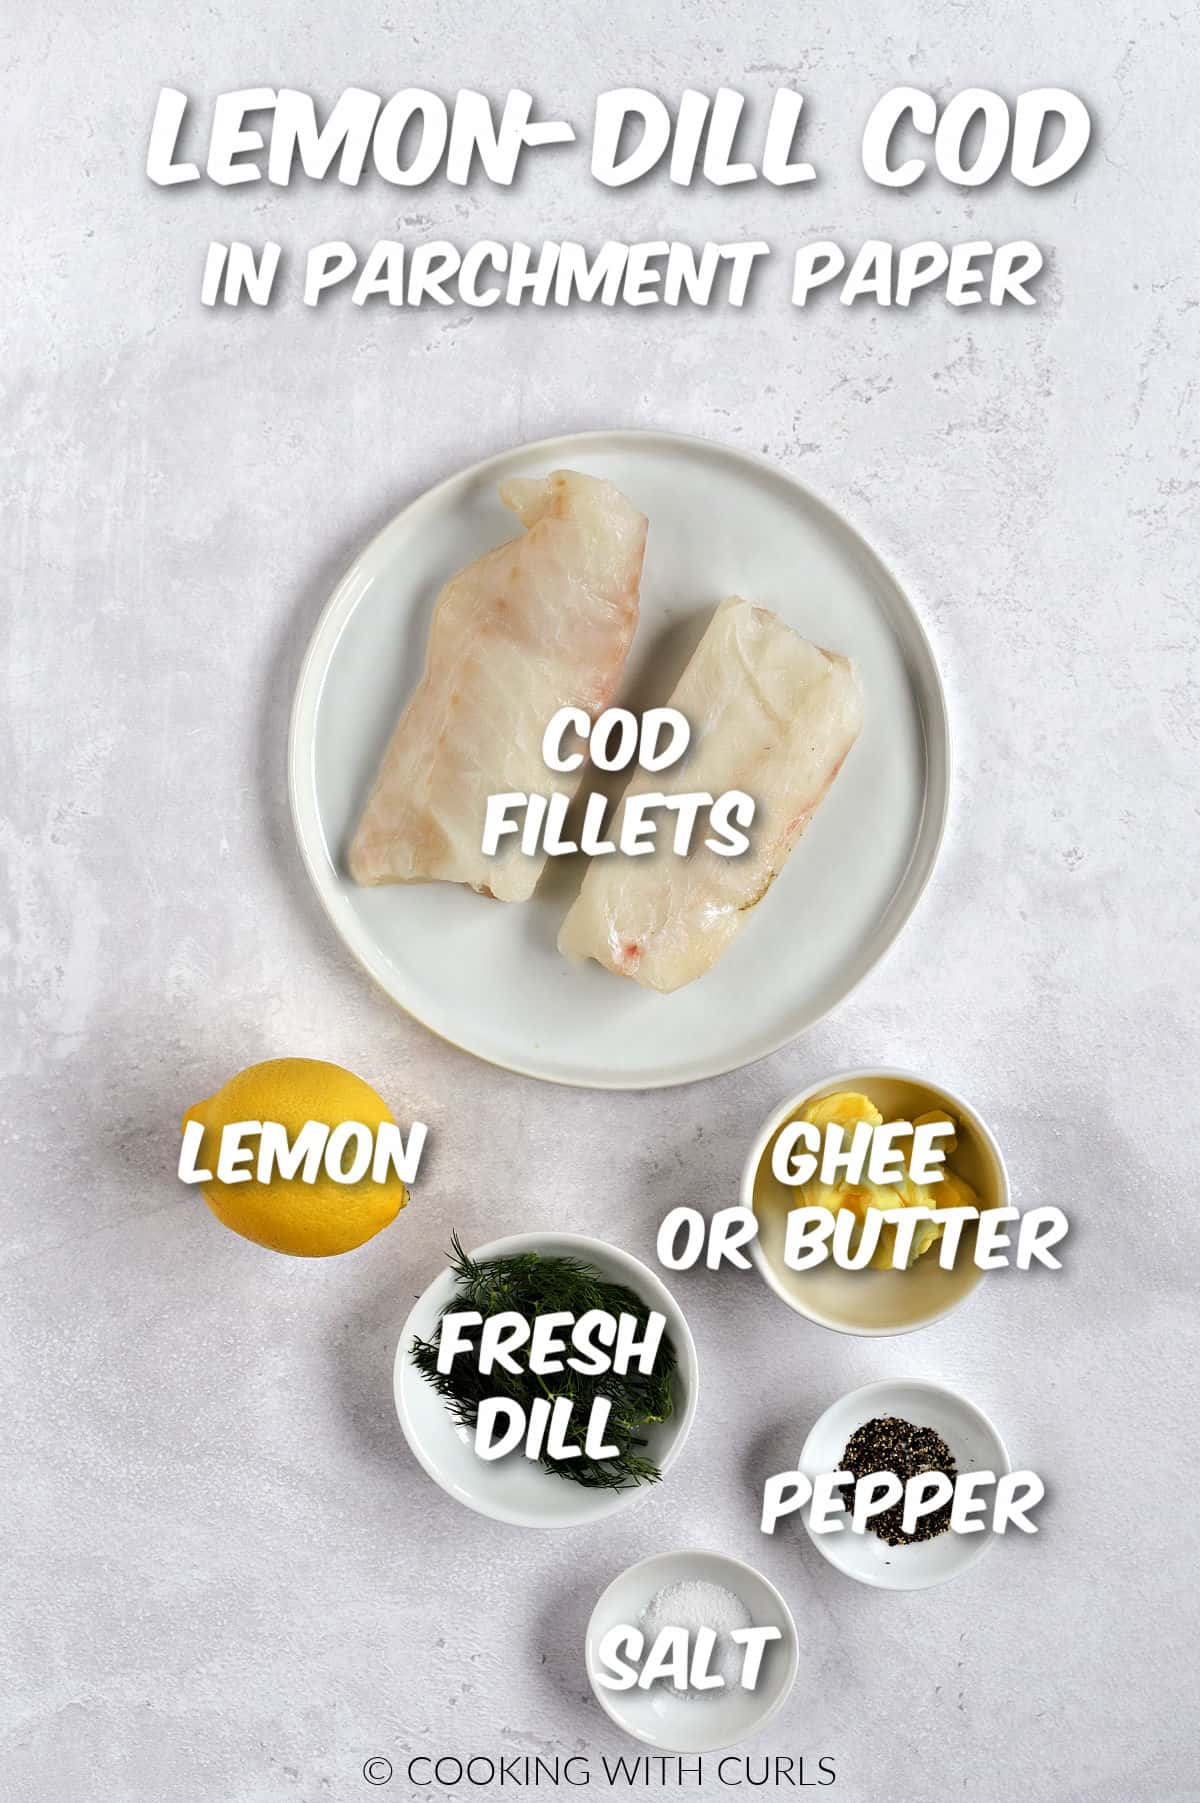 Two cod fillets, a lemon, fresh dill, butter, salt and pepper.